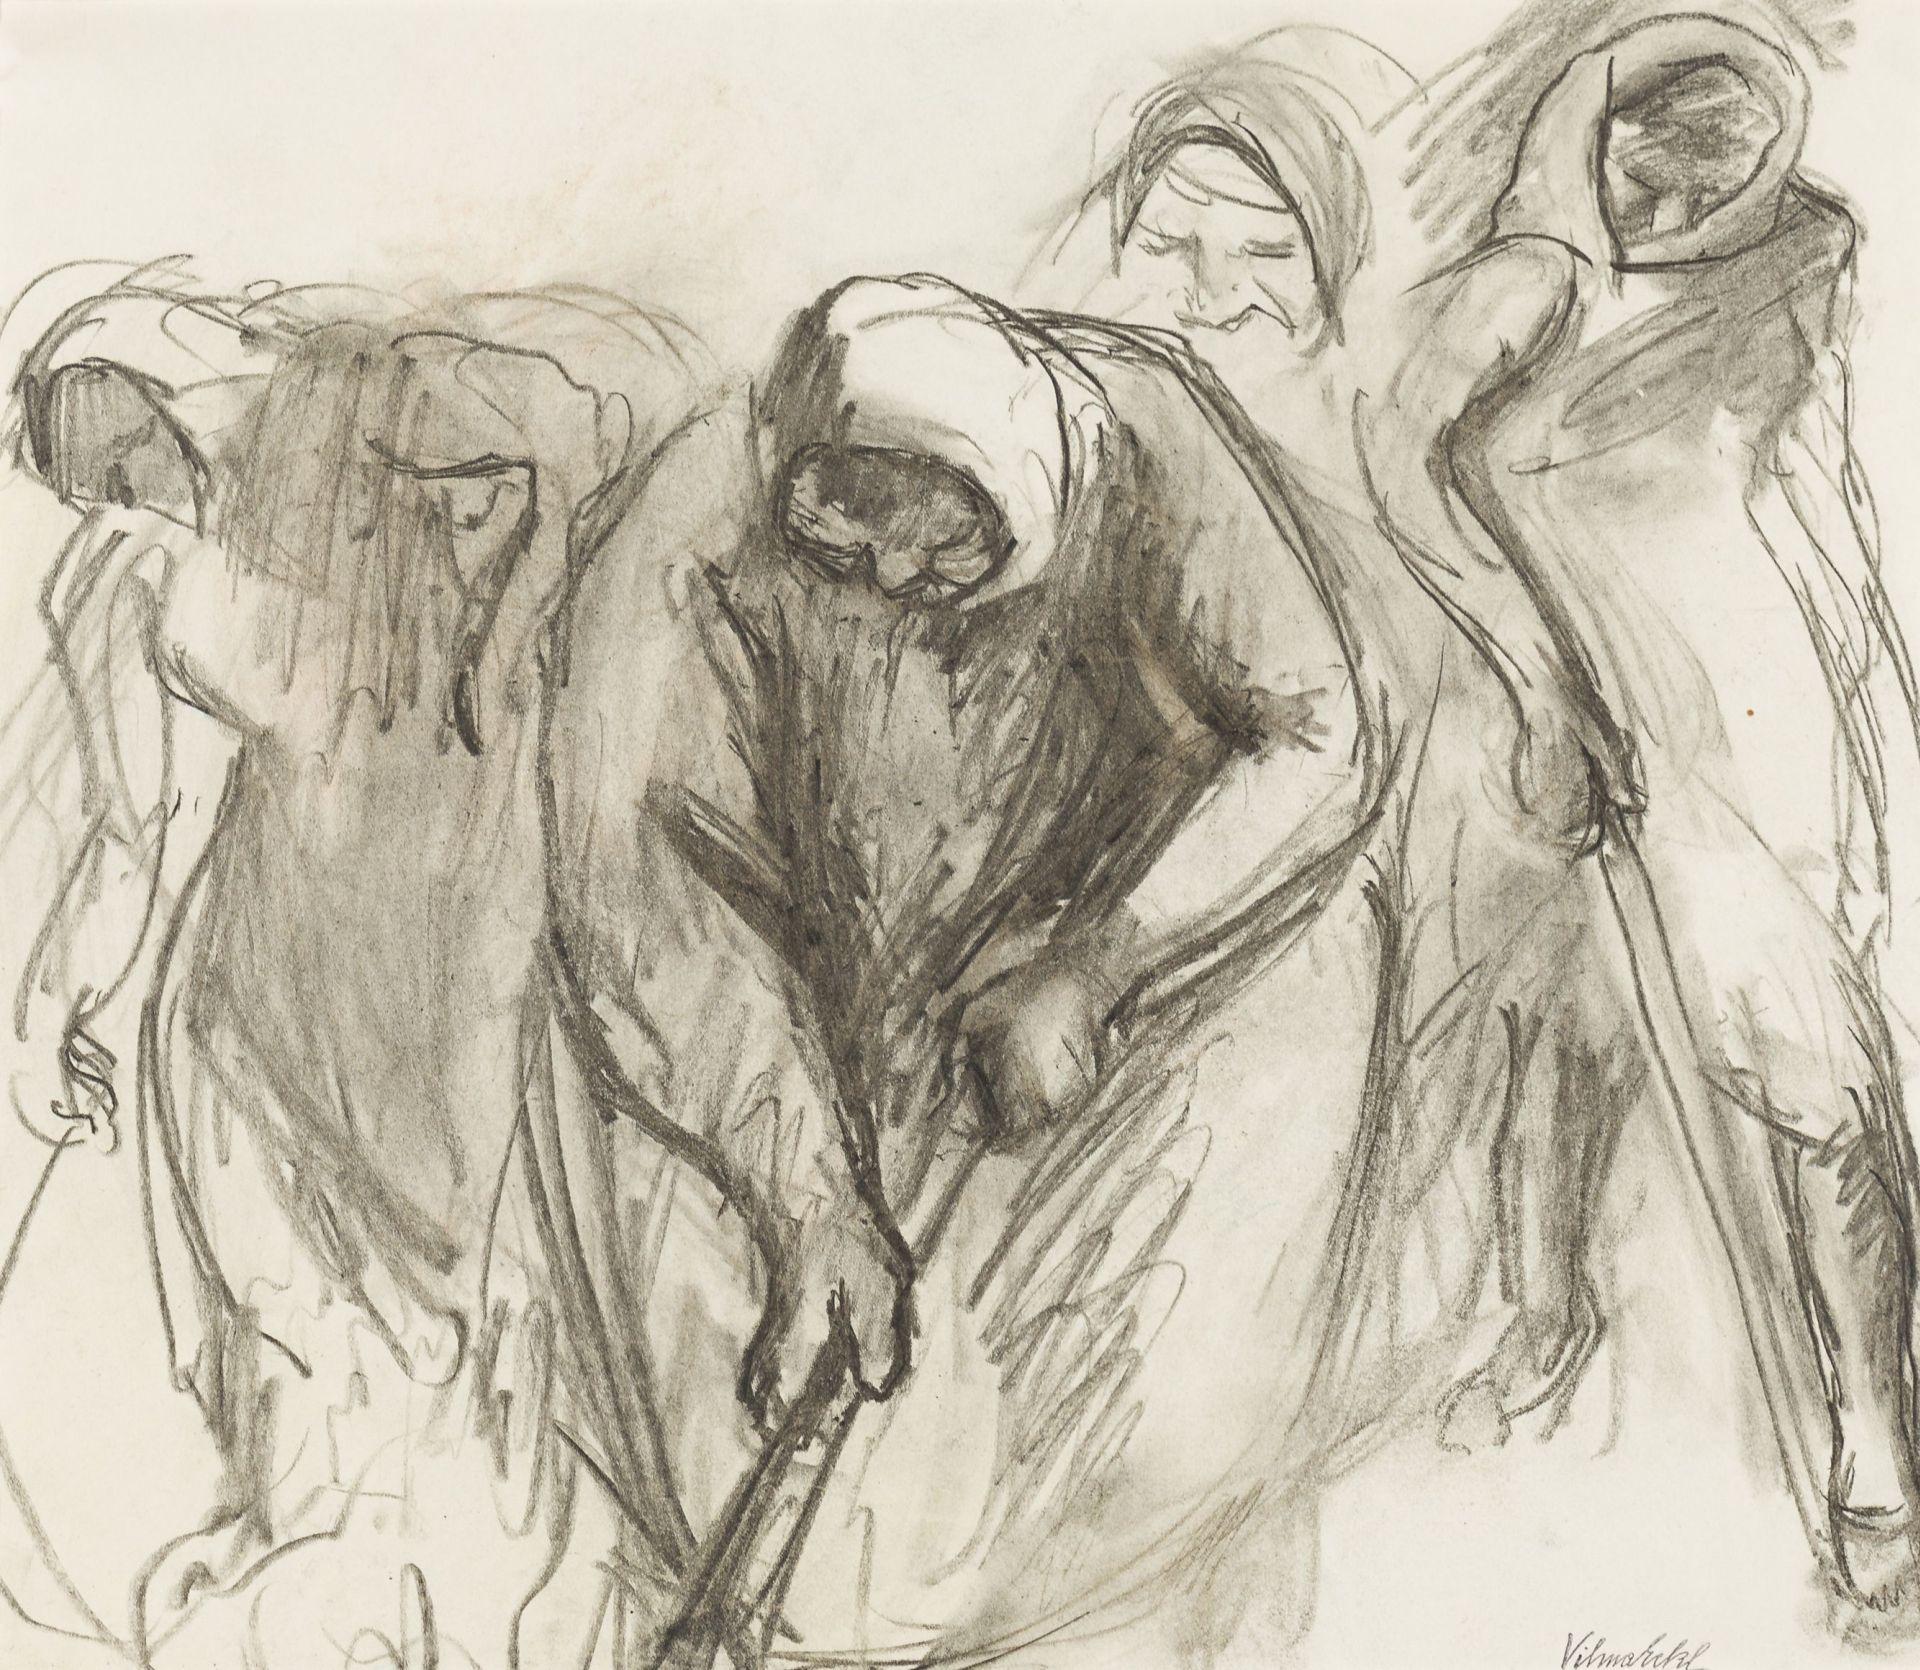 Vilma Eckl-Transylvanian women plow